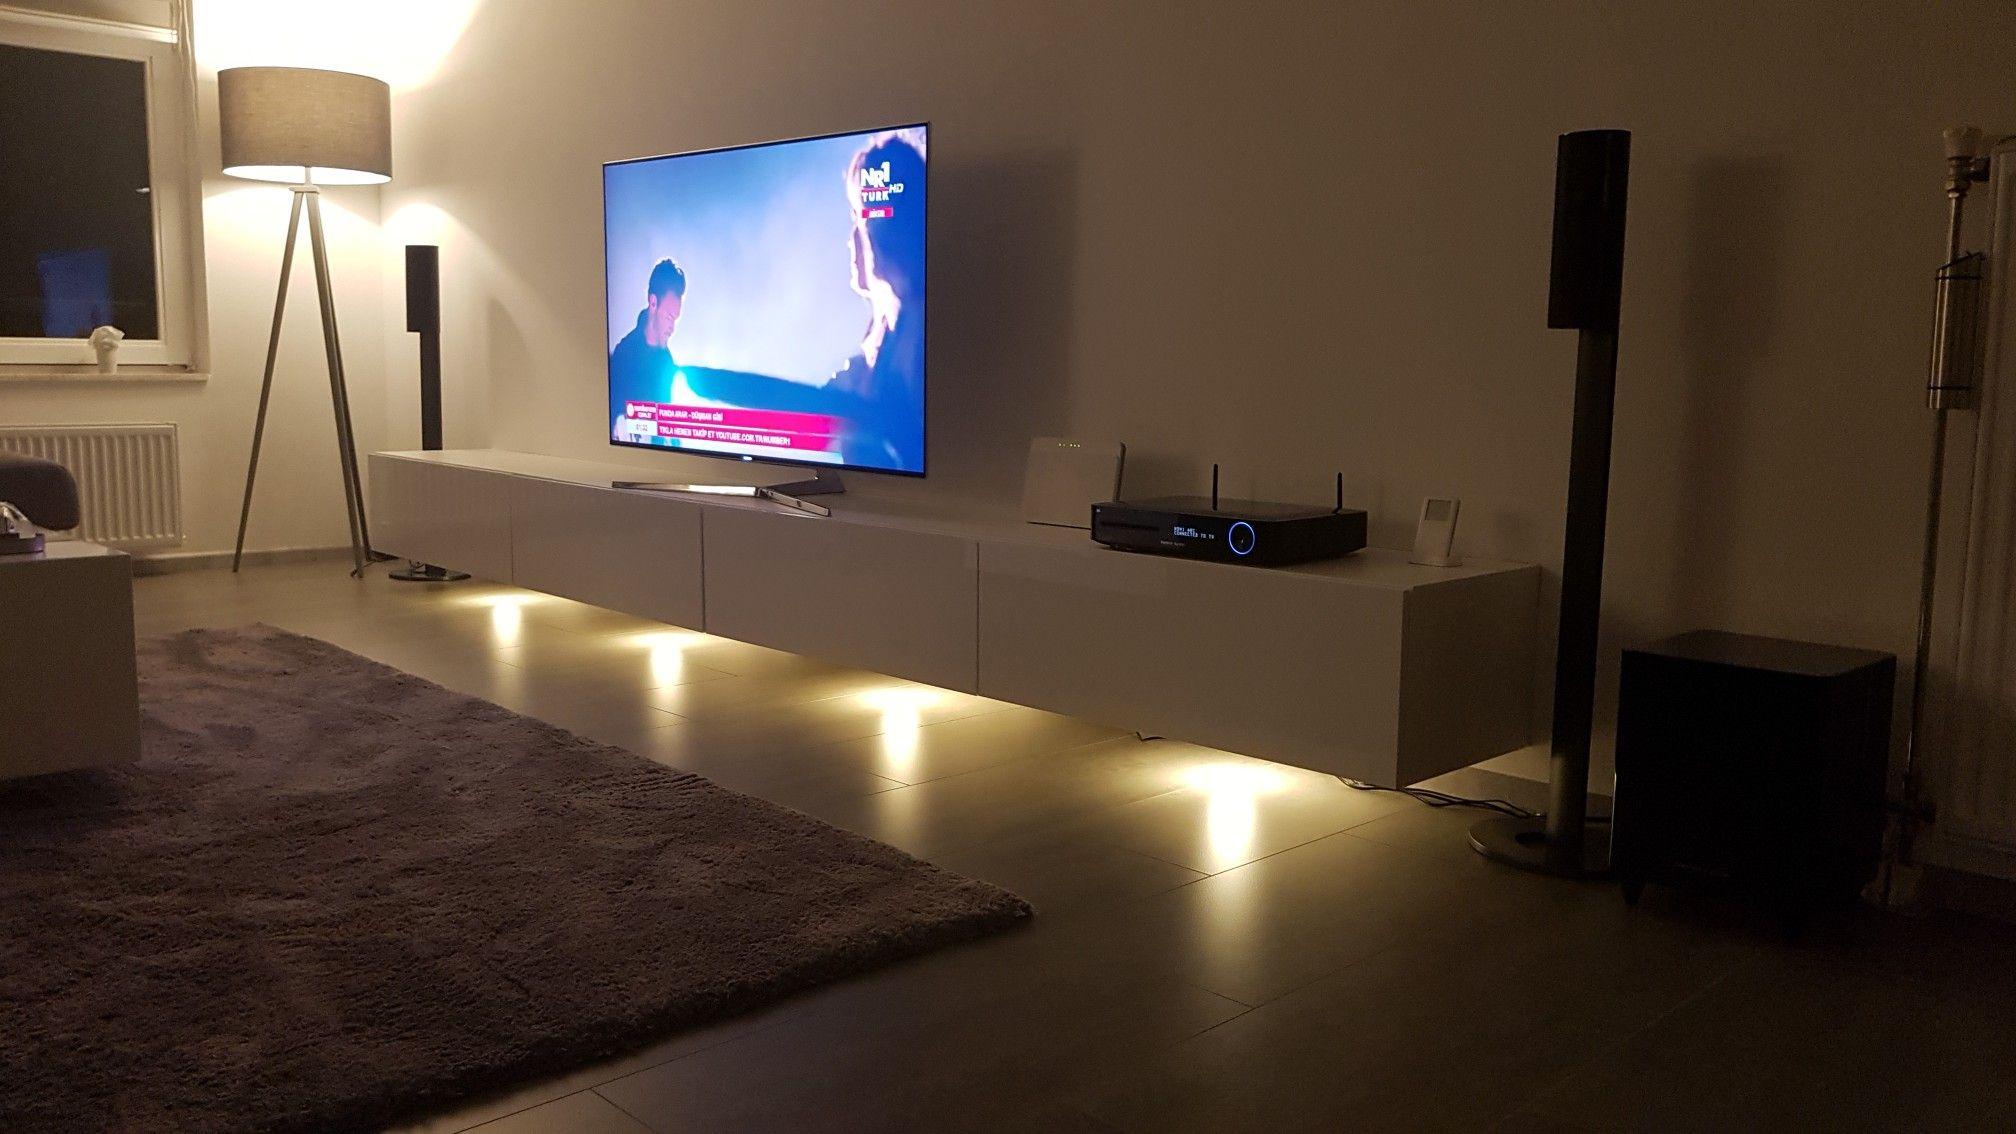 Zwevende Plank Onder Tv.Genoeg Plank Onder Tv Mai89 Agneswamu